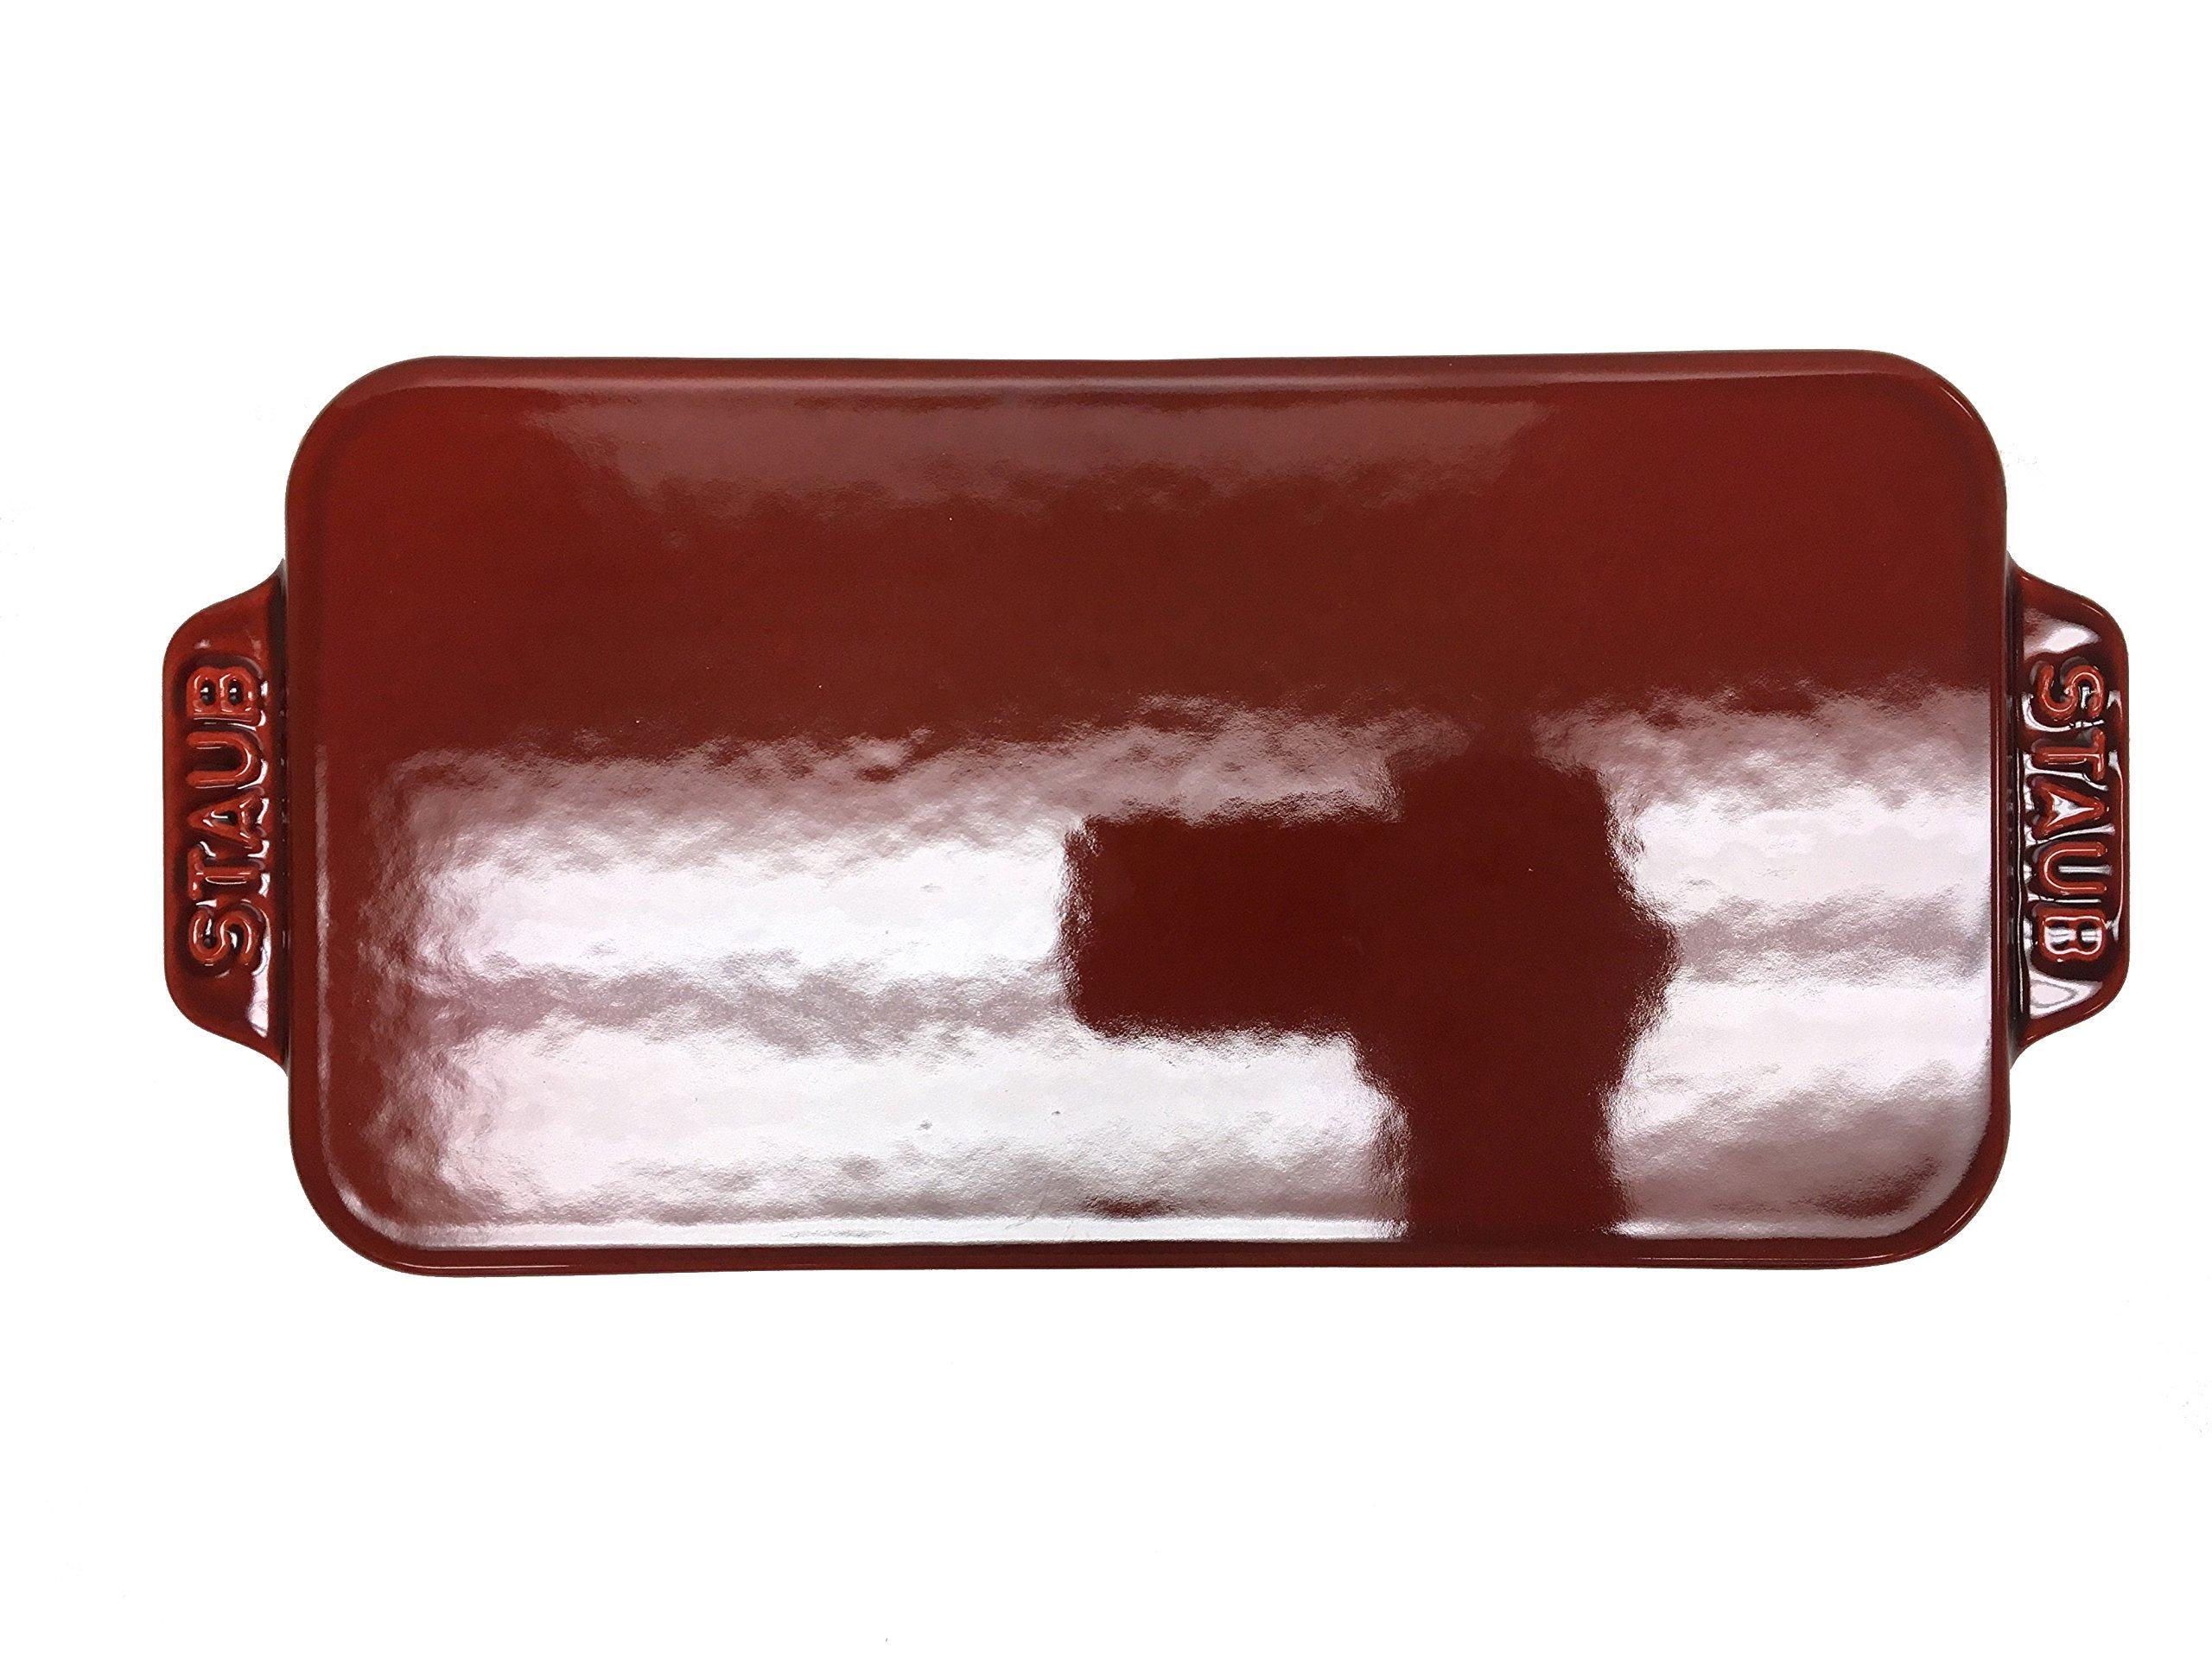 Staub Loaf Pan 1.5 Qt. (Red)